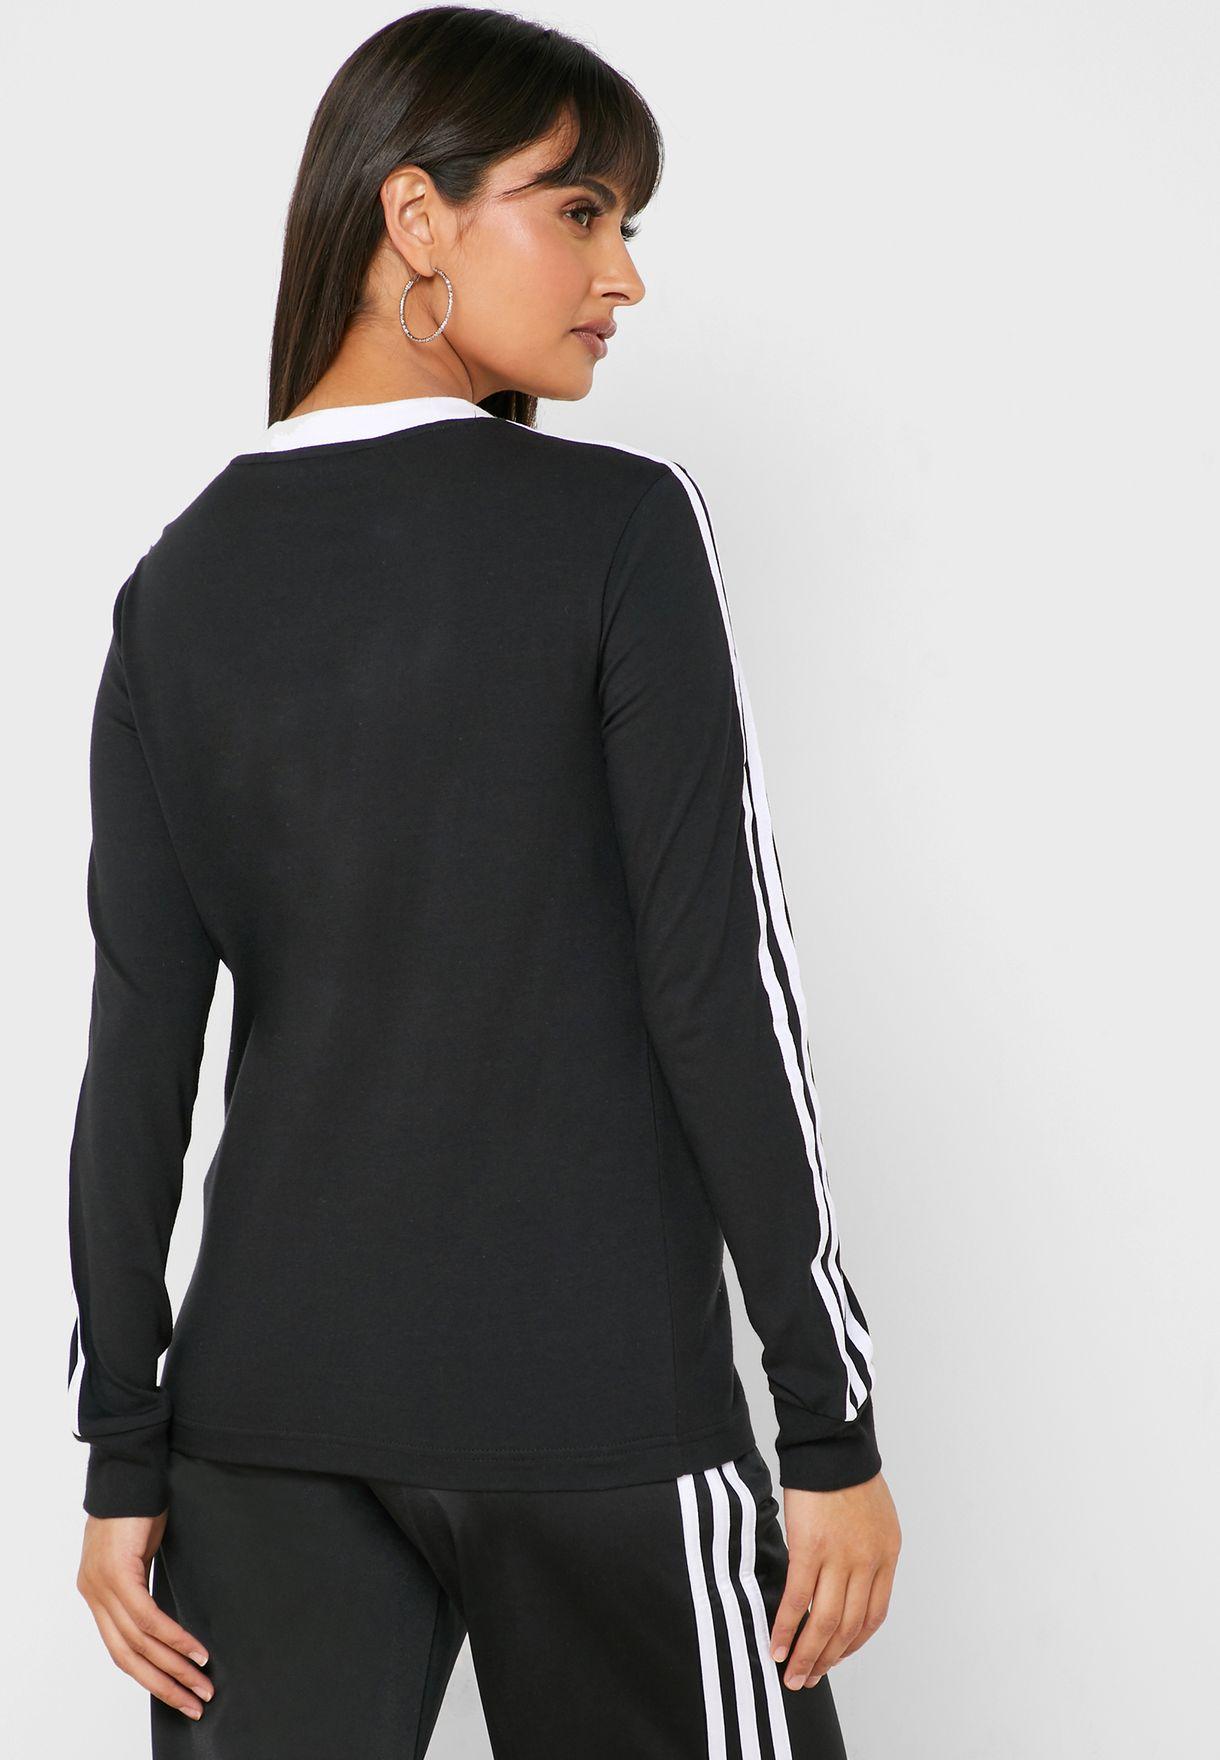 3 Stripes Casual Women's Long Sleeve T-Shirt